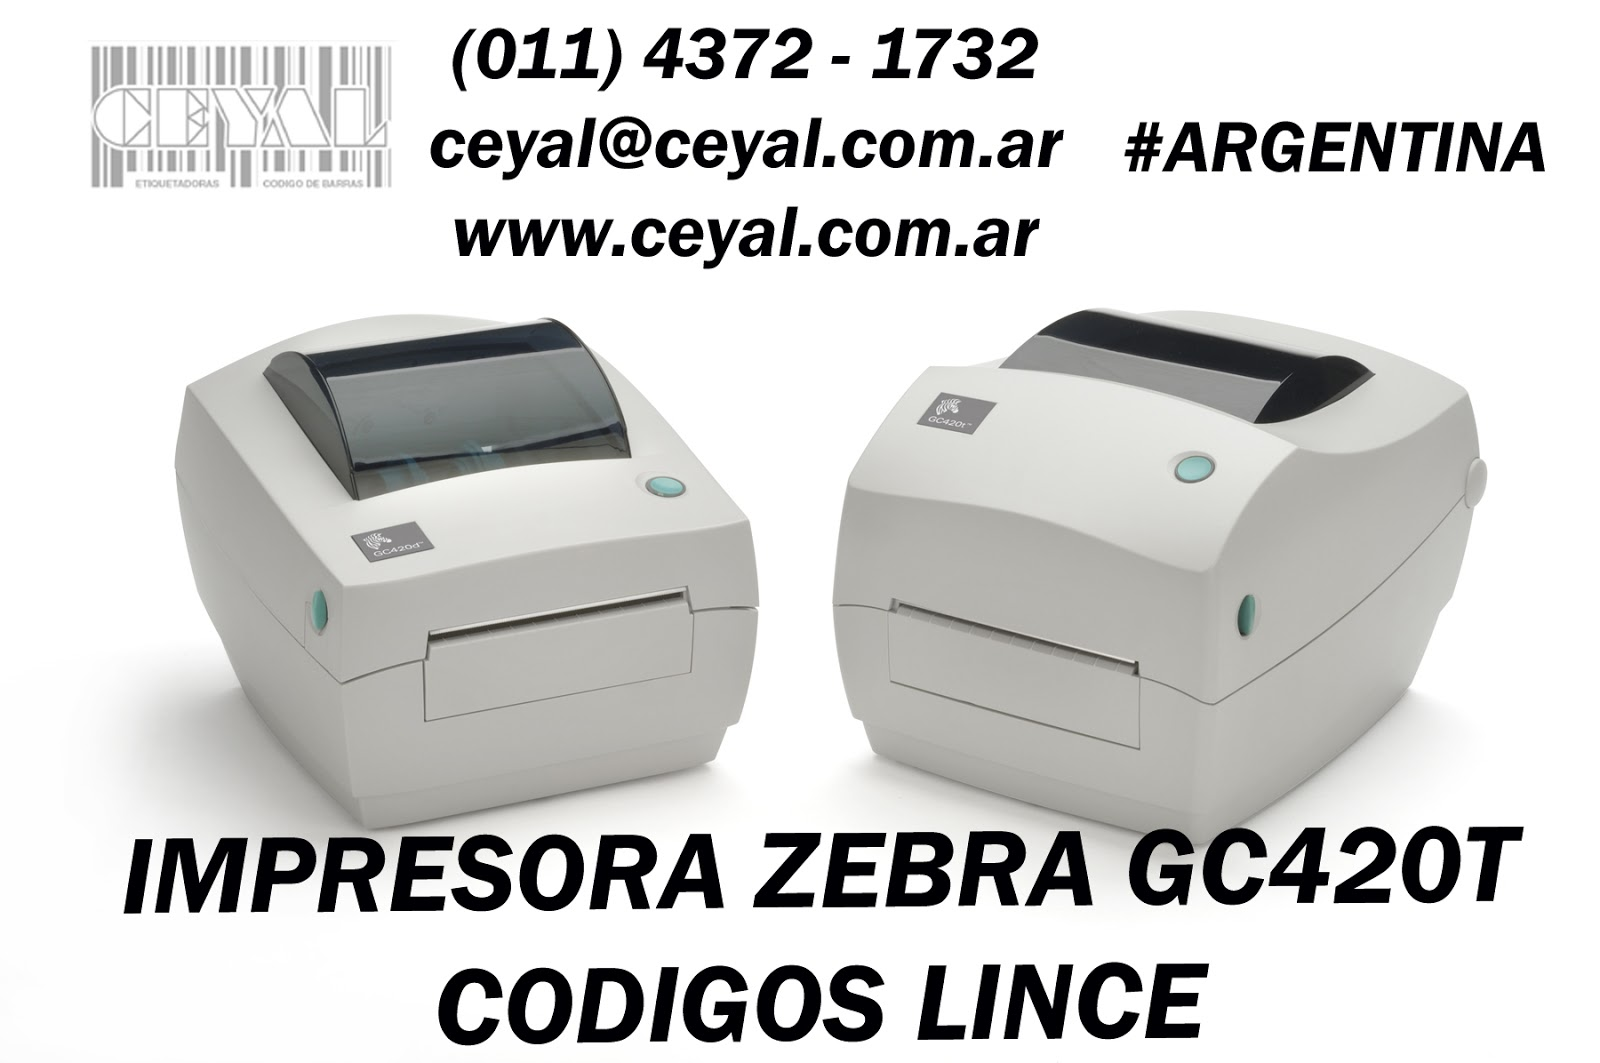 Impresora codigo de barra Mendoza